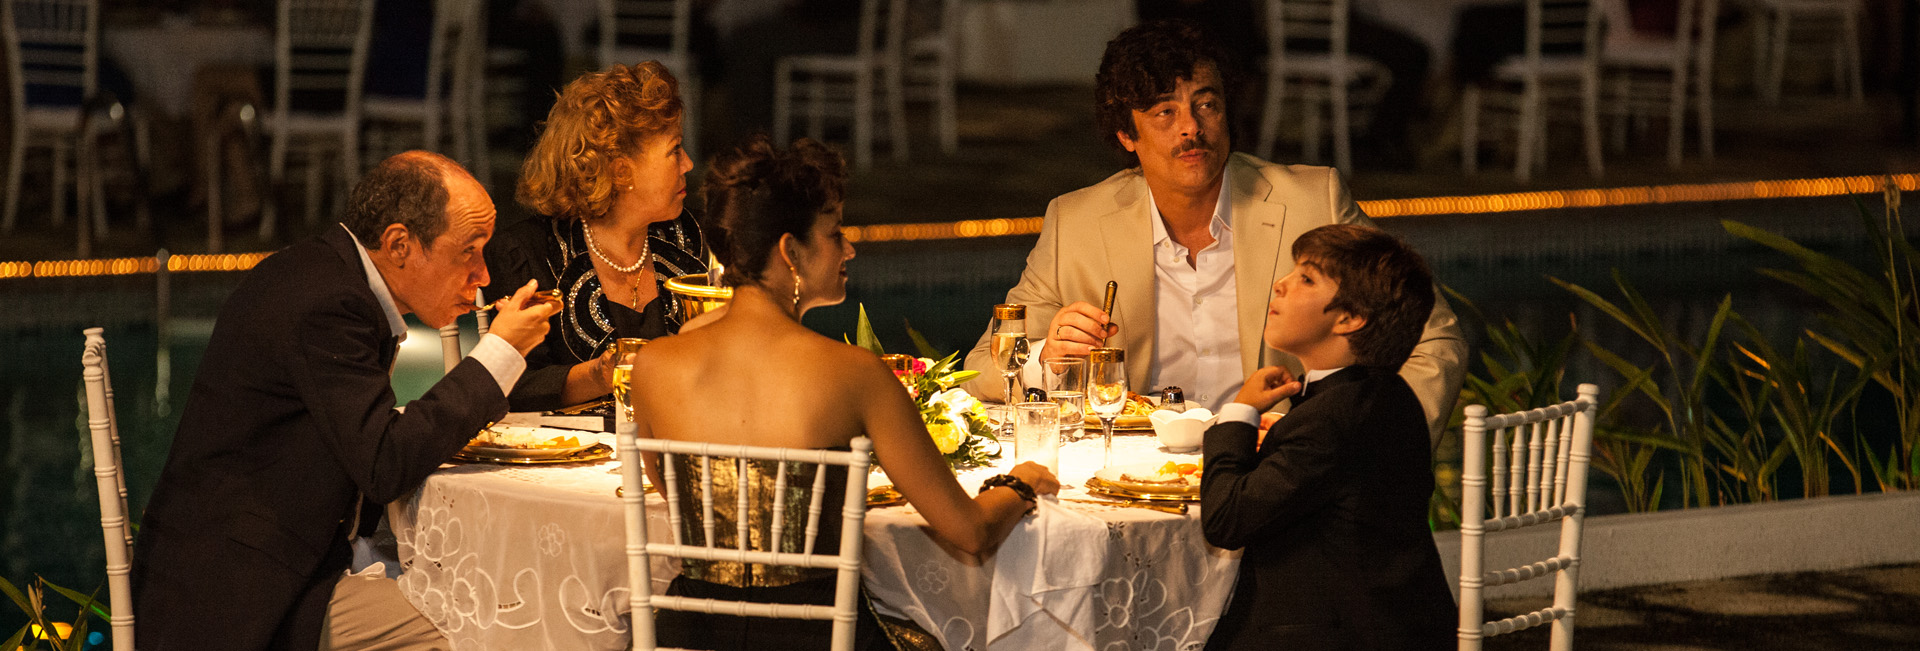 Escobar Paradise Lost - 17.jpg